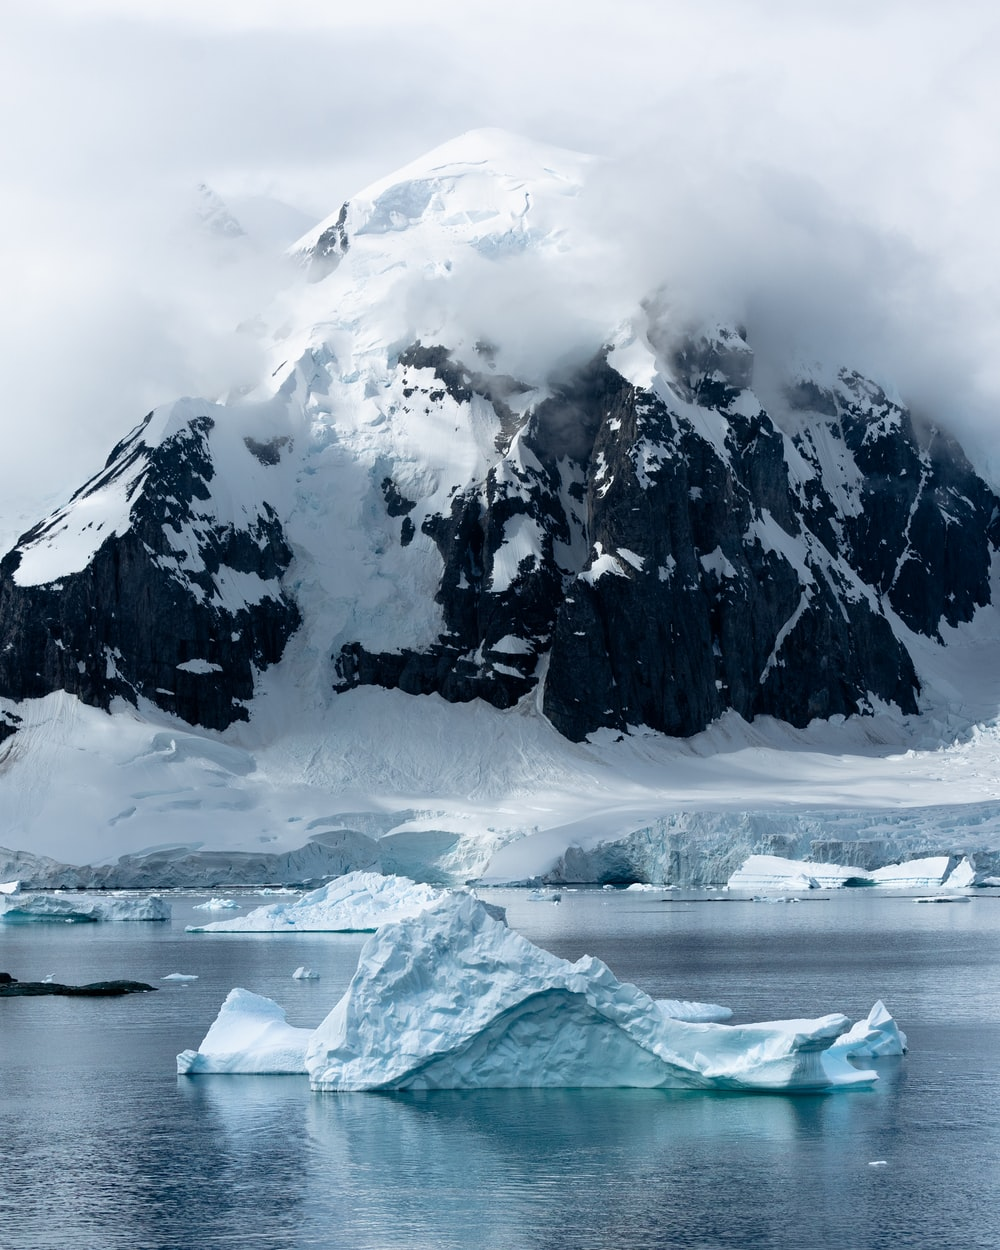 small iceberg beside large iceberg